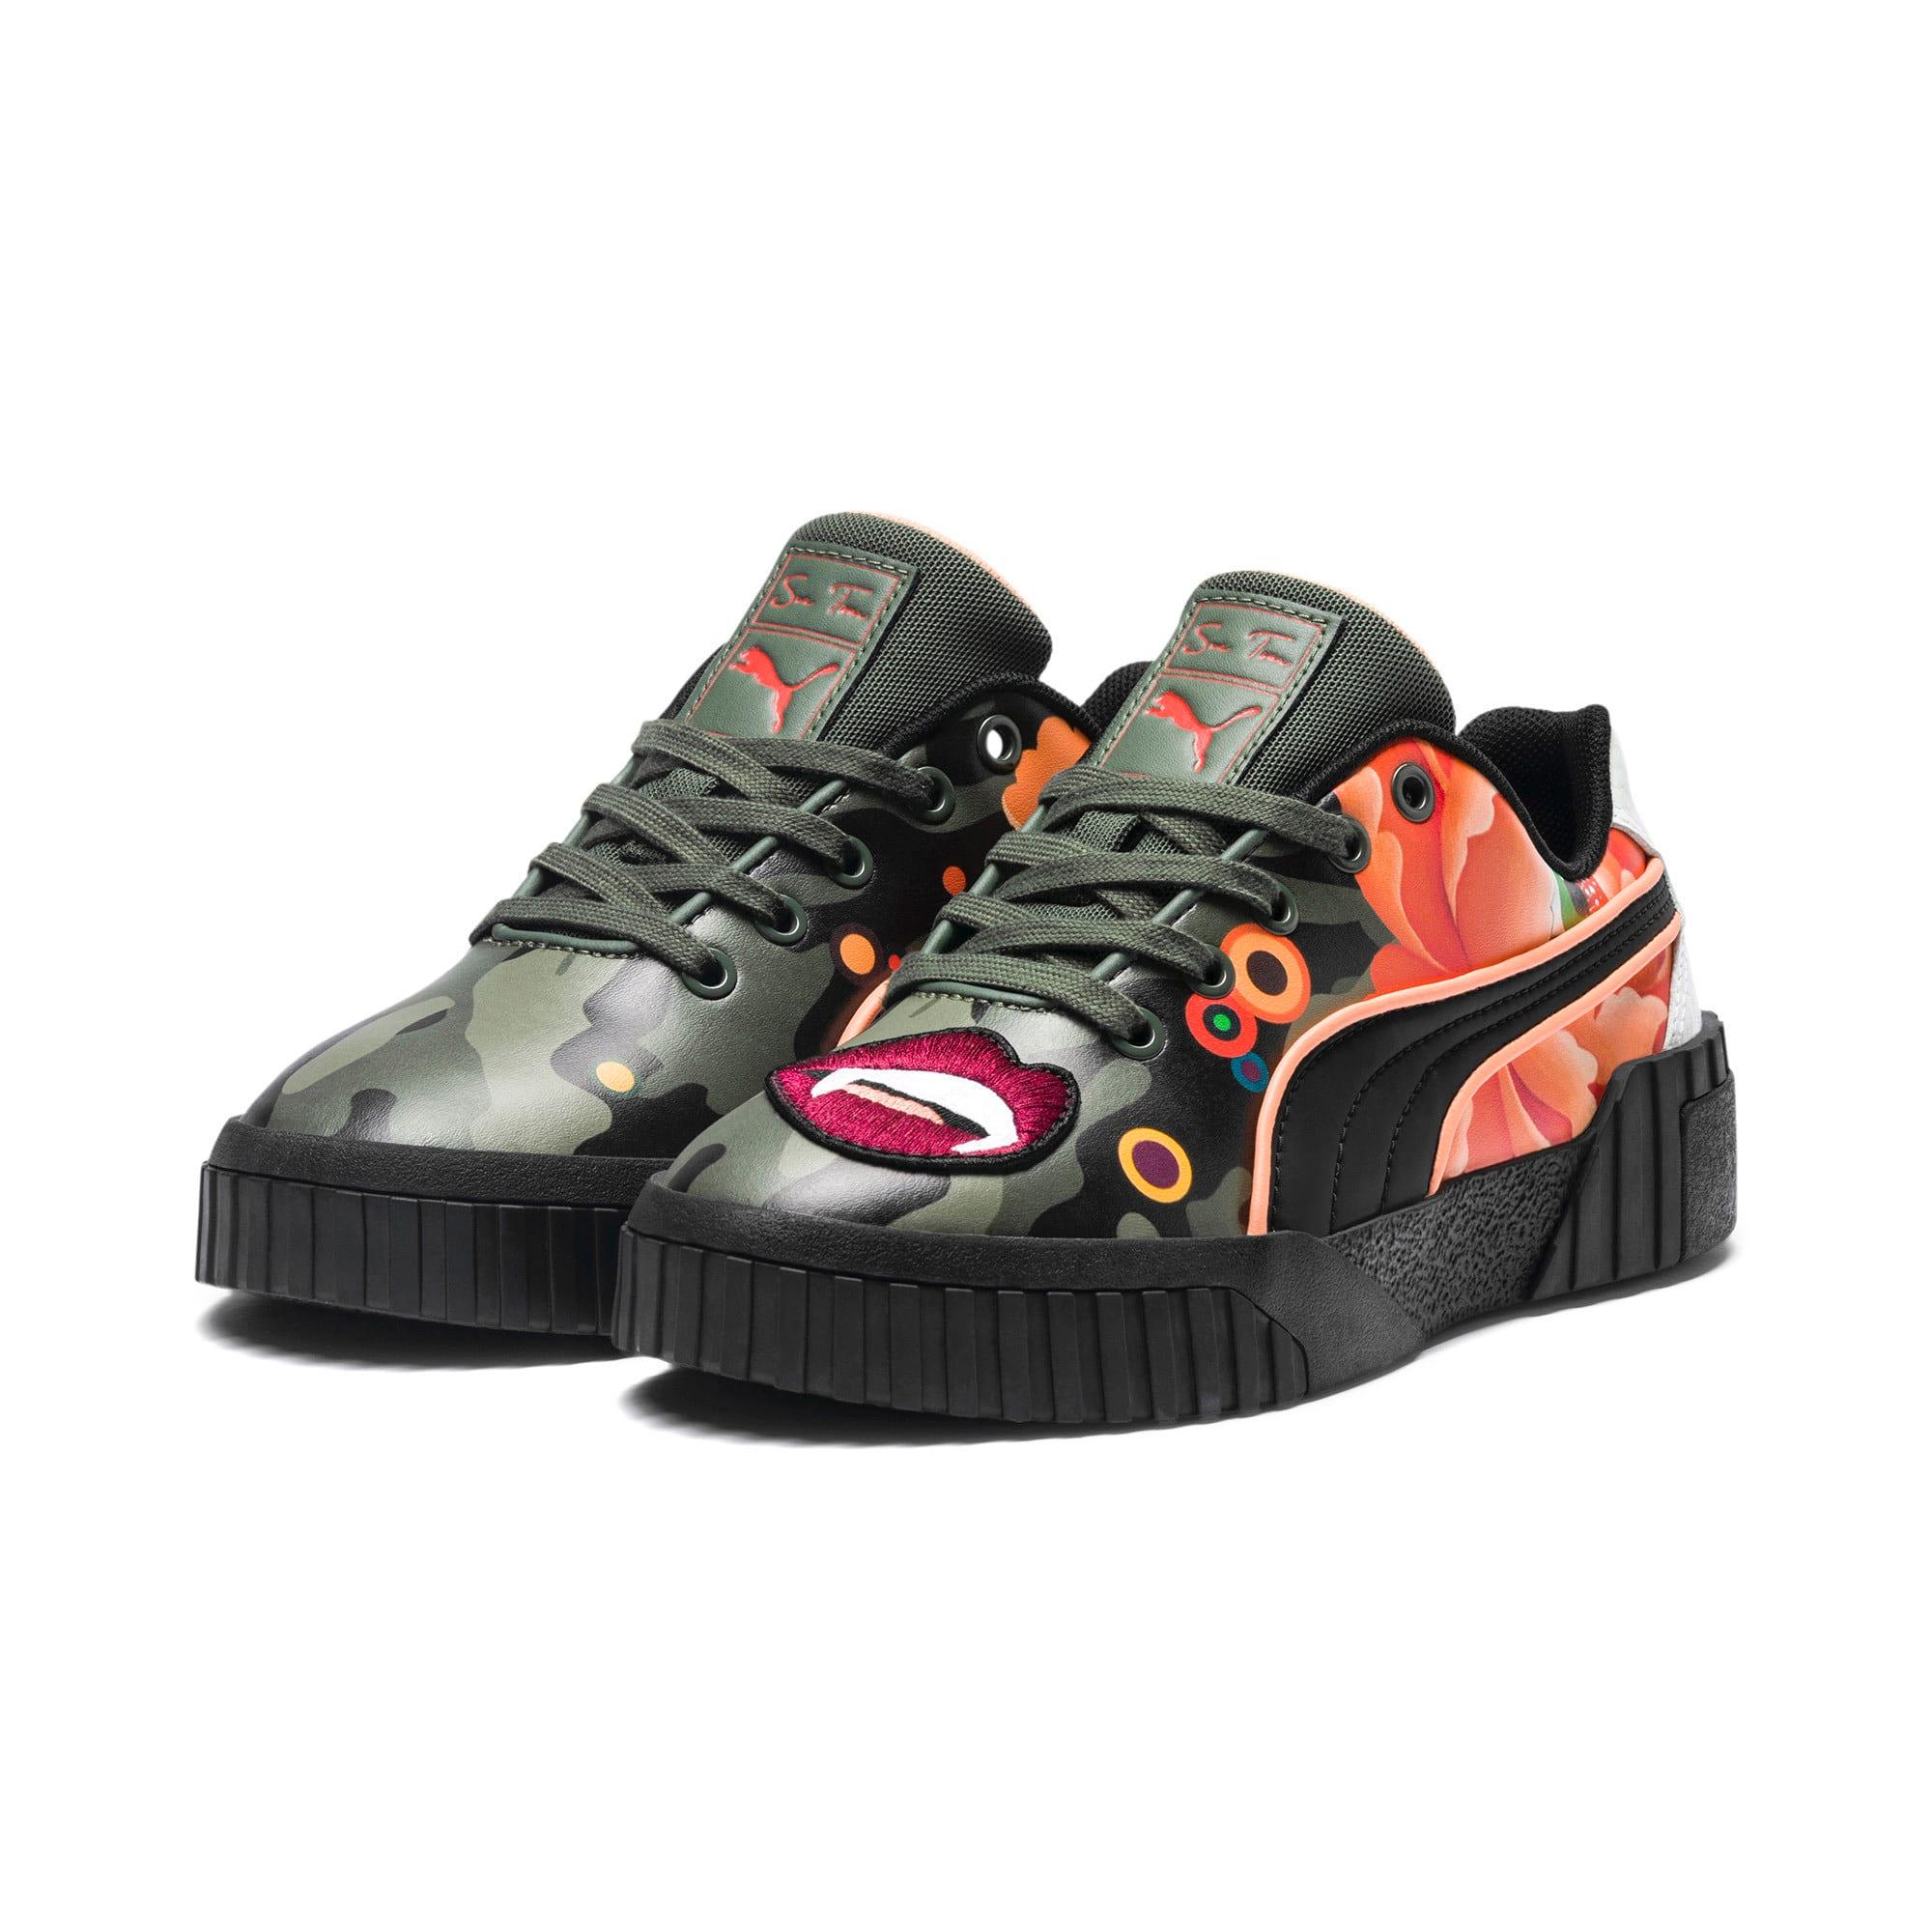 Thumbnail 3 of PUMA x SUE TSAI Cali Peonies Camo Women's Sneakers, Puma Black-Puma Black, medium